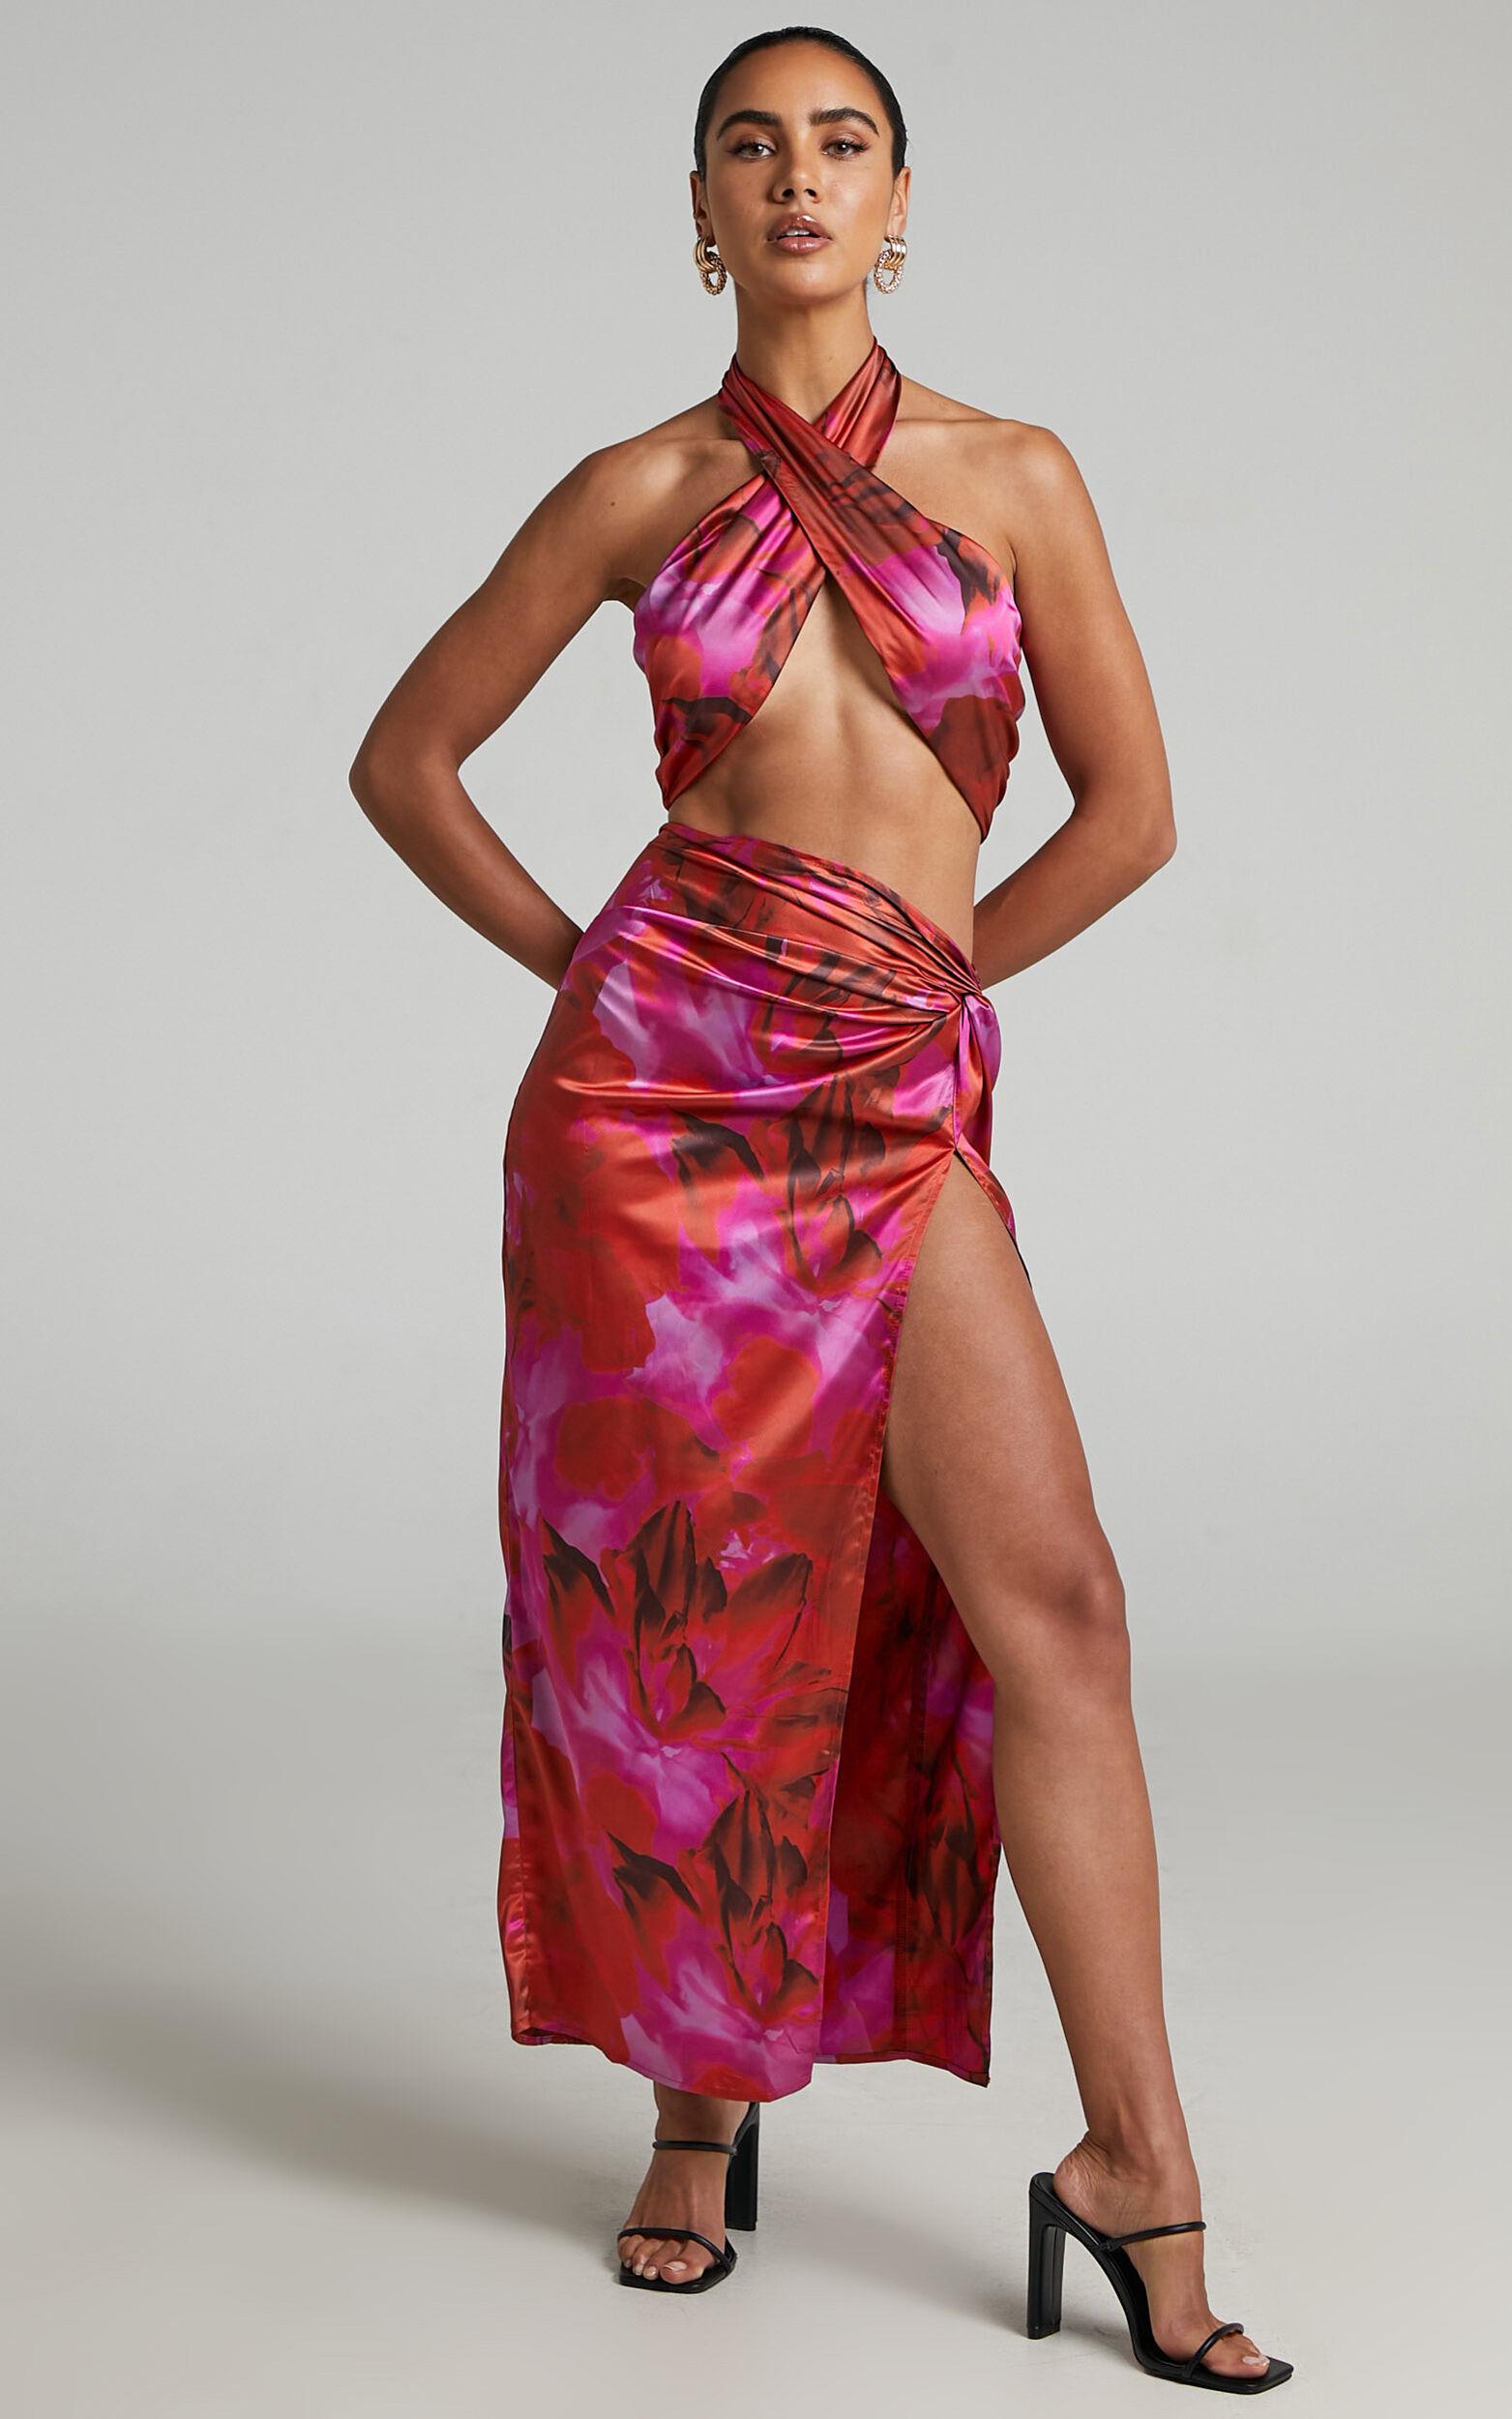 RUNAWAY THE LABEL - SCARLETT TOP in Pink Floral - L, PNK1, super-hi-res image number null